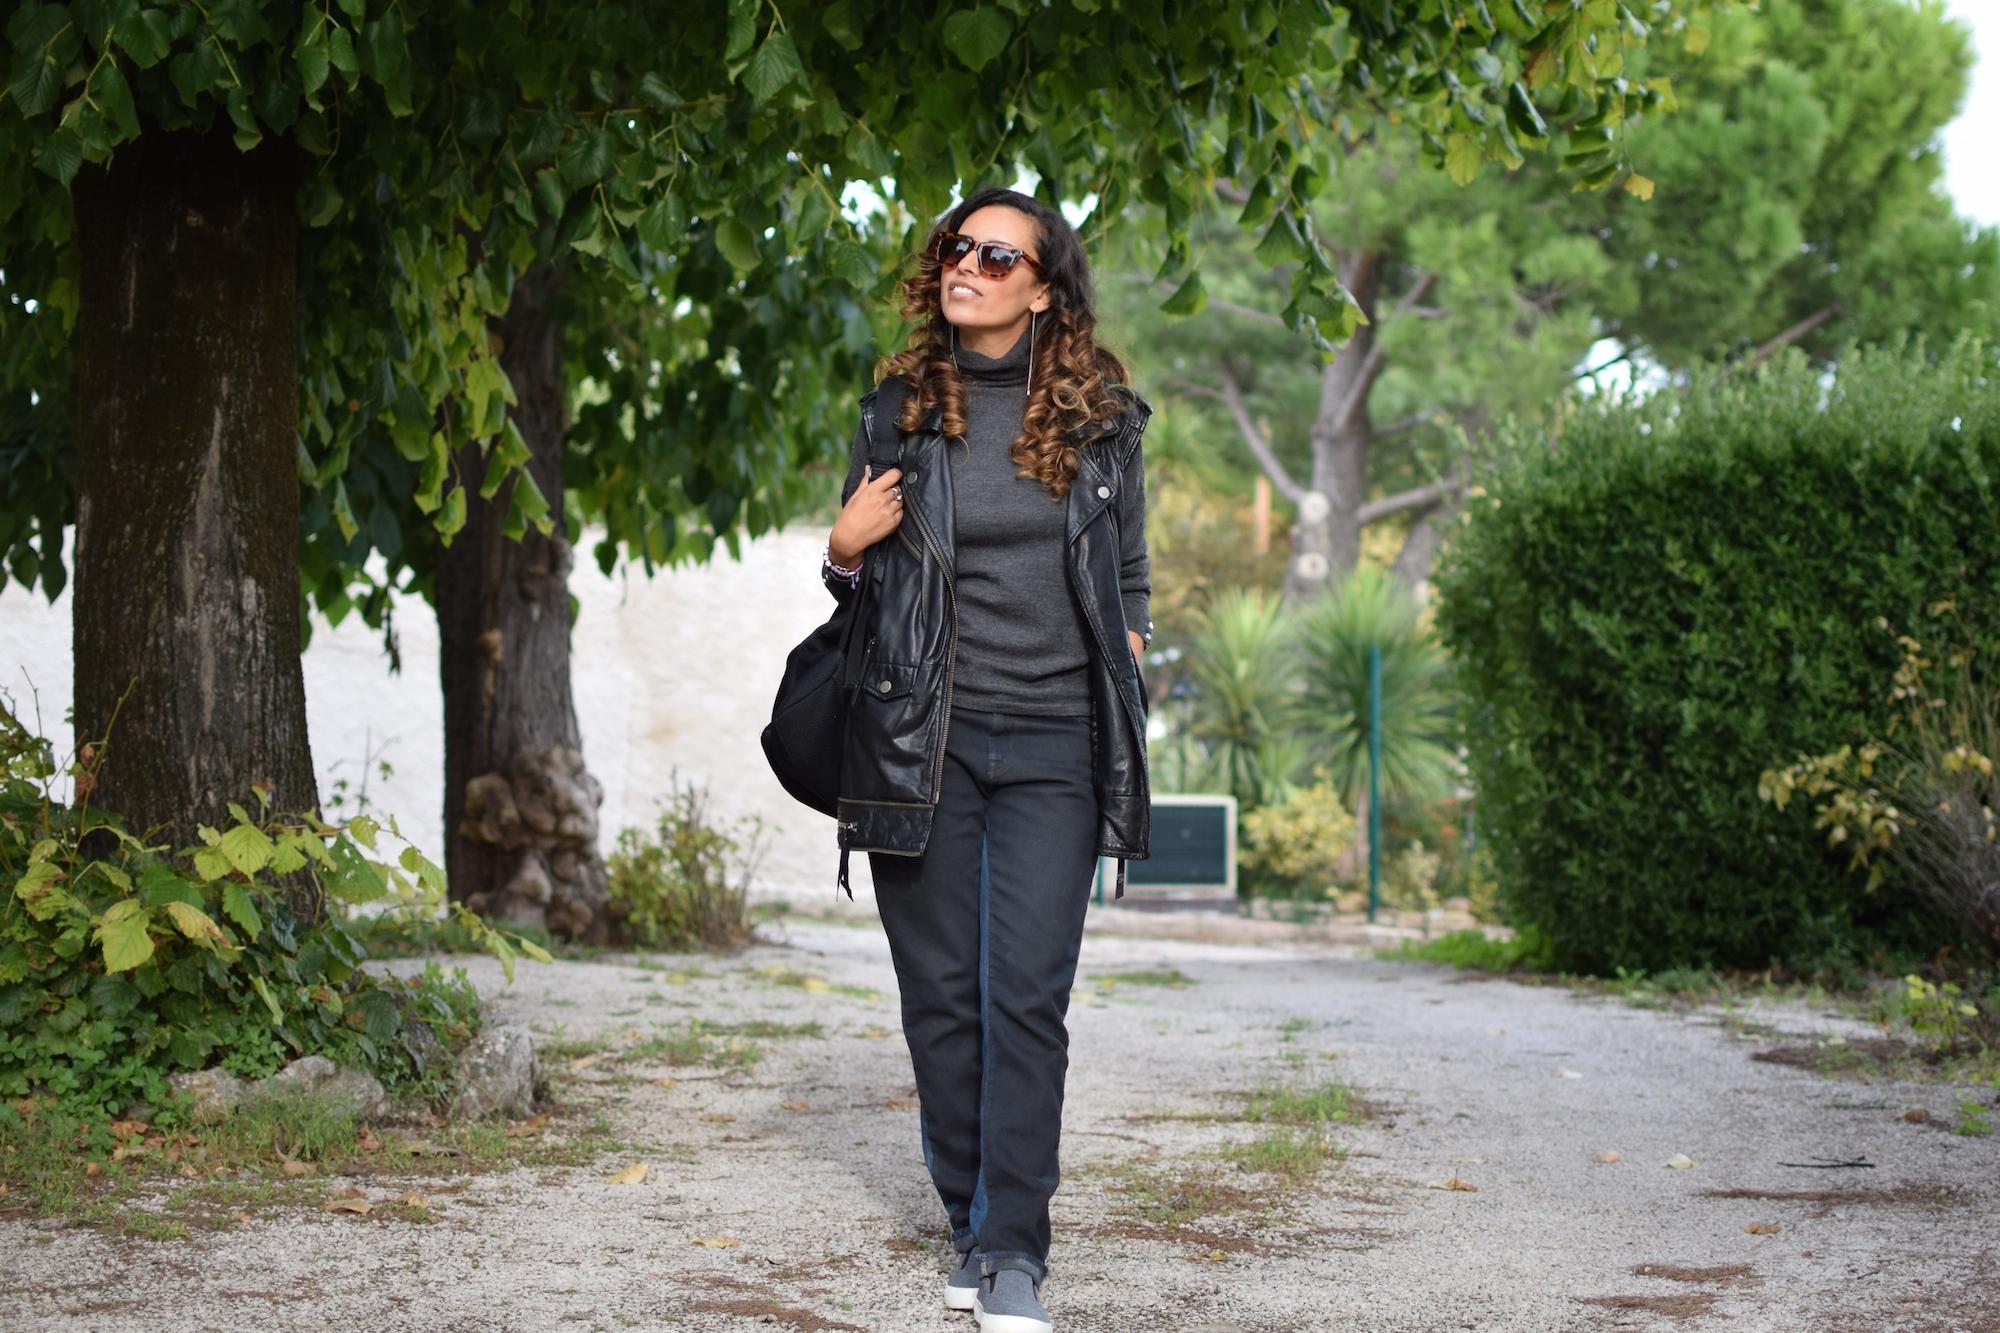 Le teen spirit | LovaLinda | Blog Photo Mode Marseille | Sandro, Karl Lagerfeld, RiverIsland, Zara, Each x Other, Asos